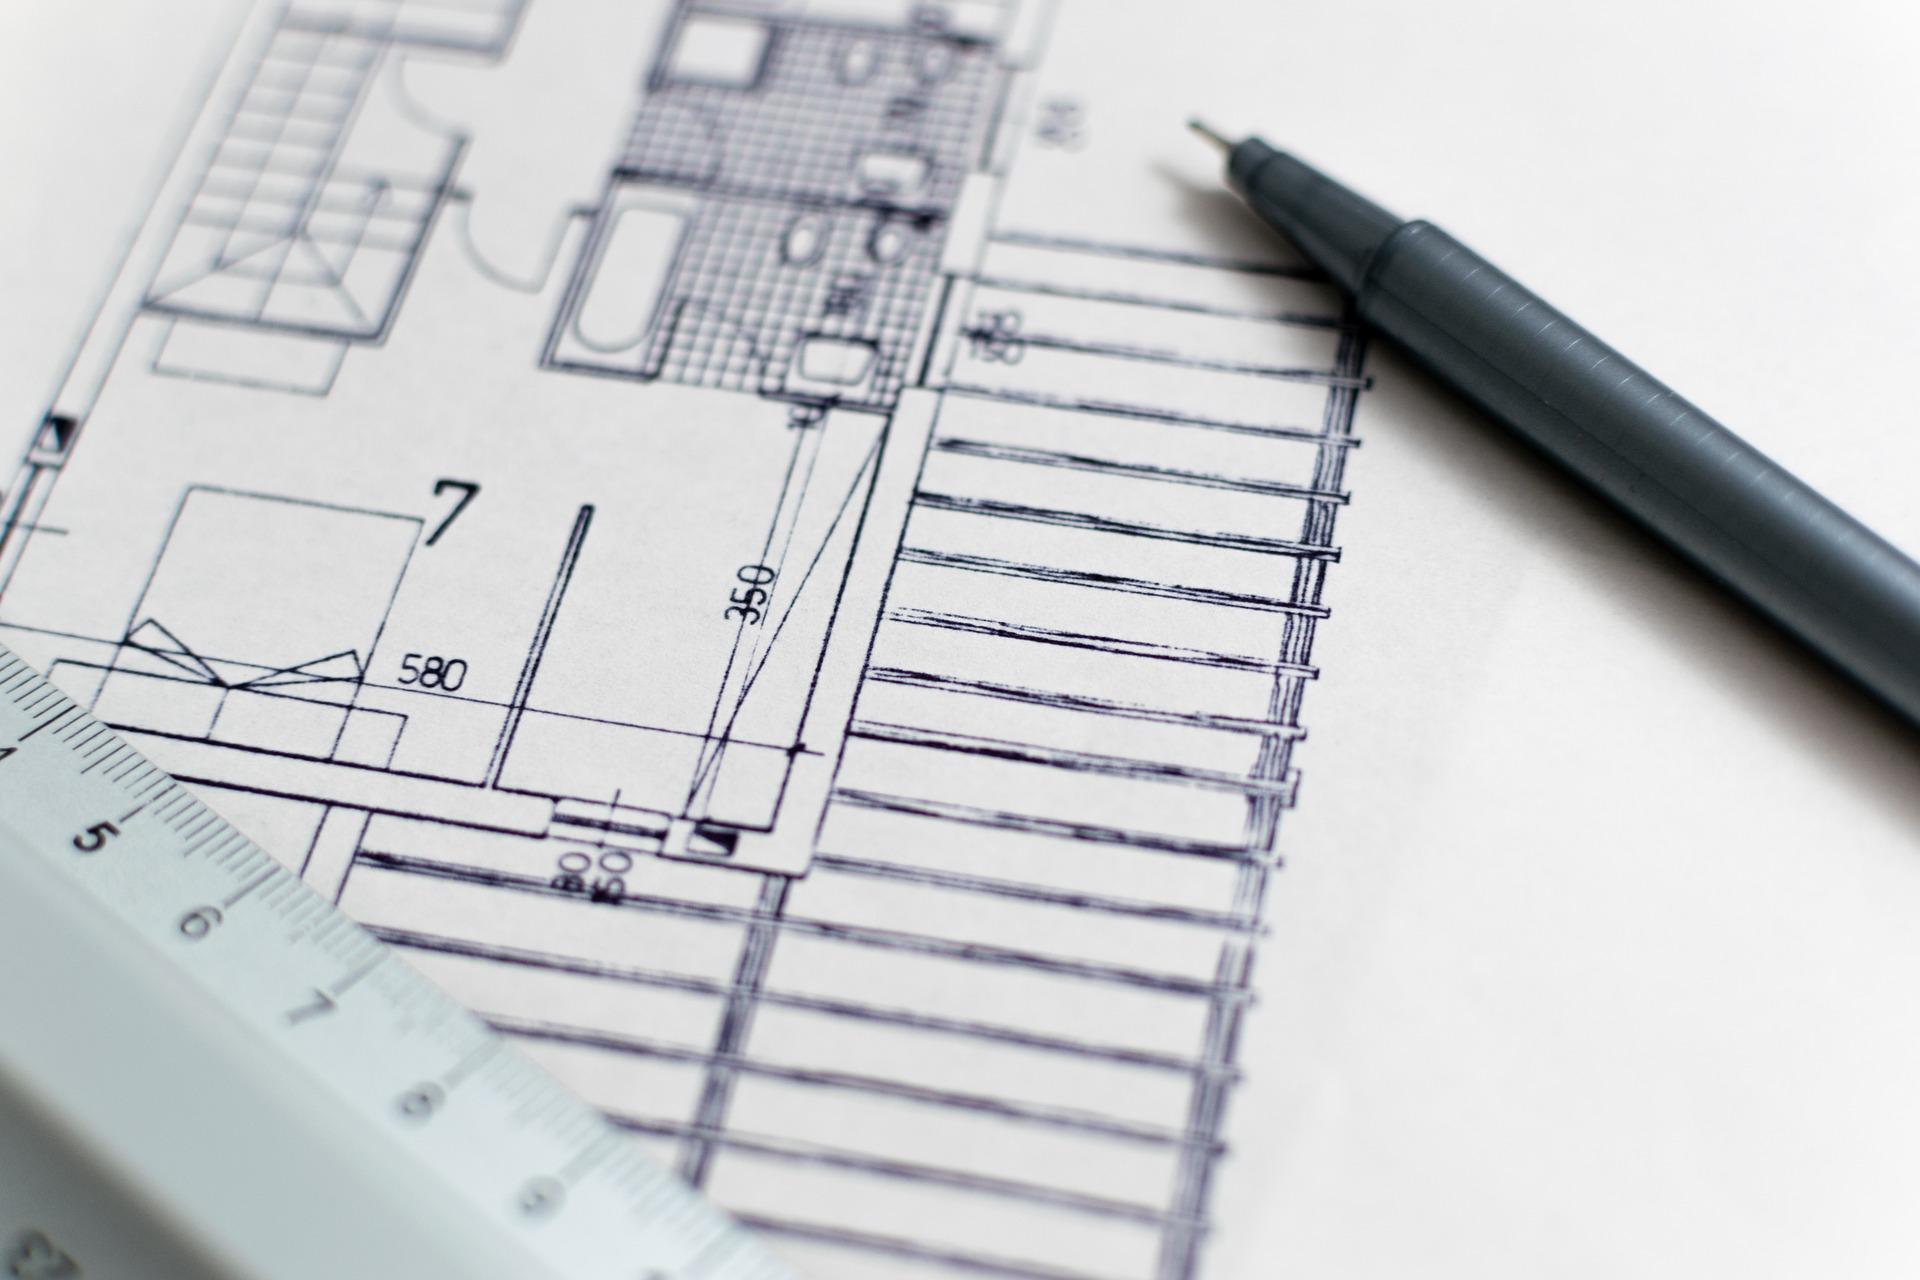 Construtora é condenada a pagar multa por imóvel entregue com atraso